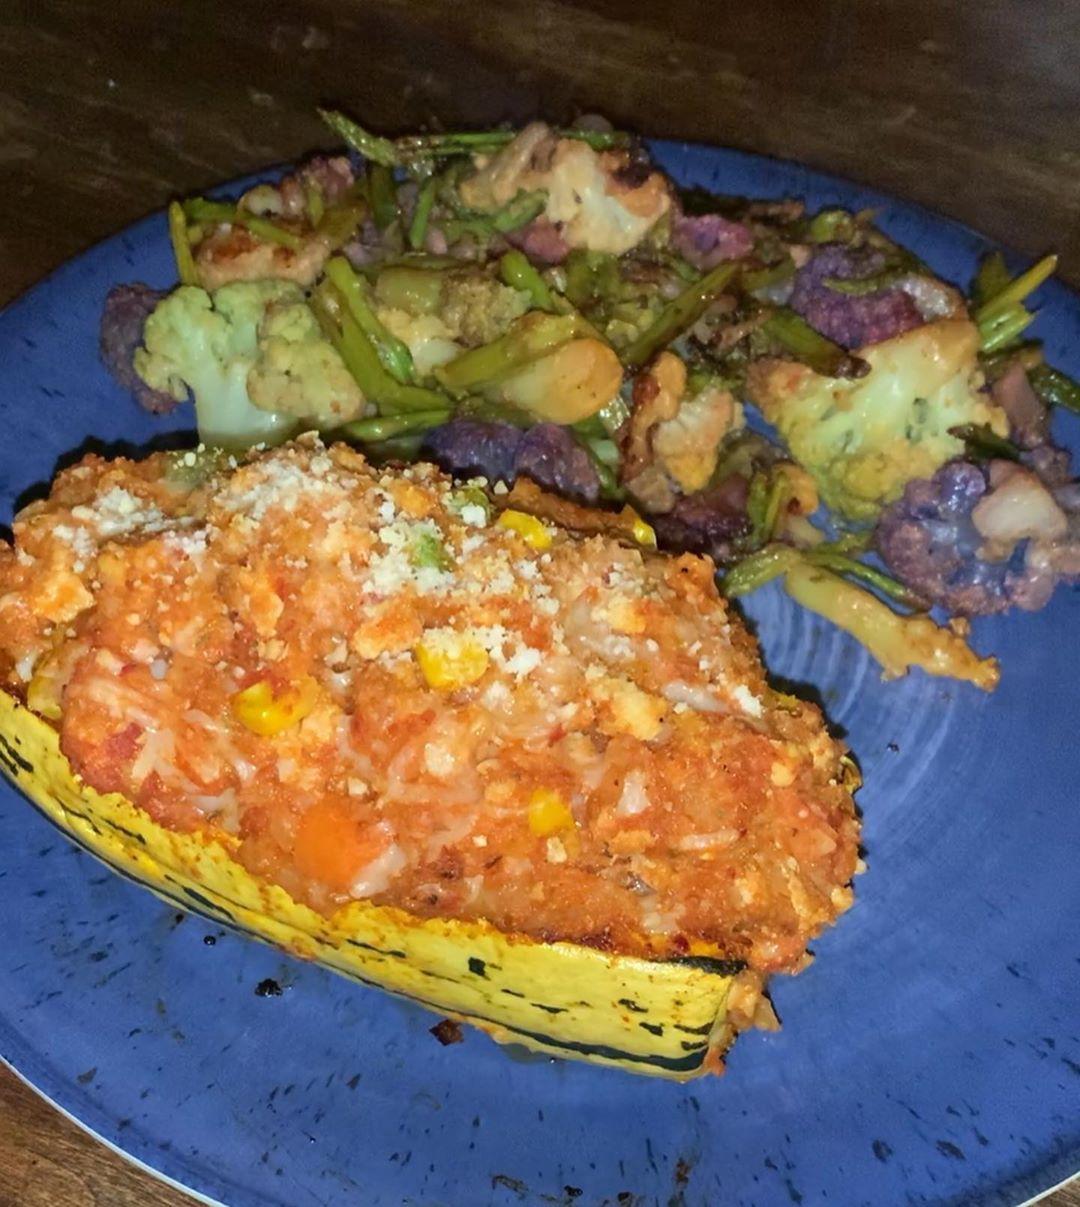 Friday night dinner was amazing!! Stuffed Delicata Squash (2sp) rainbow broccoli (0sp) and asparagus (0sp). The... #fridaynightdinner